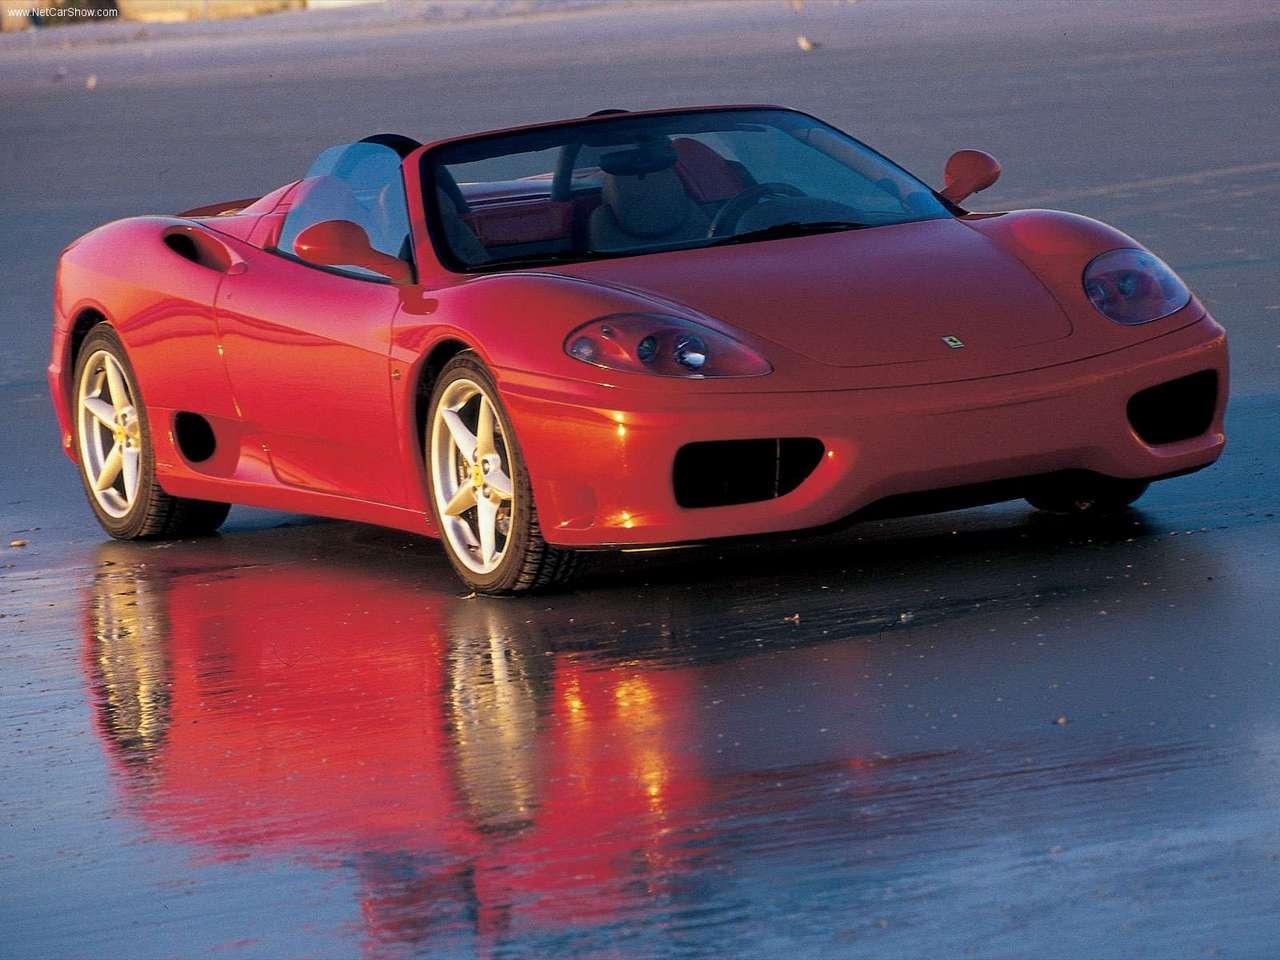 http://3.bp.blogspot.com/-ZNuKB9rr-0A/TYwmoa3beZI/AAAAAAAADVQ/CvOdBjZ85Ok/s1600/Ferrari-360_Spider_2001_1280x960_wallpaper_04.jpg